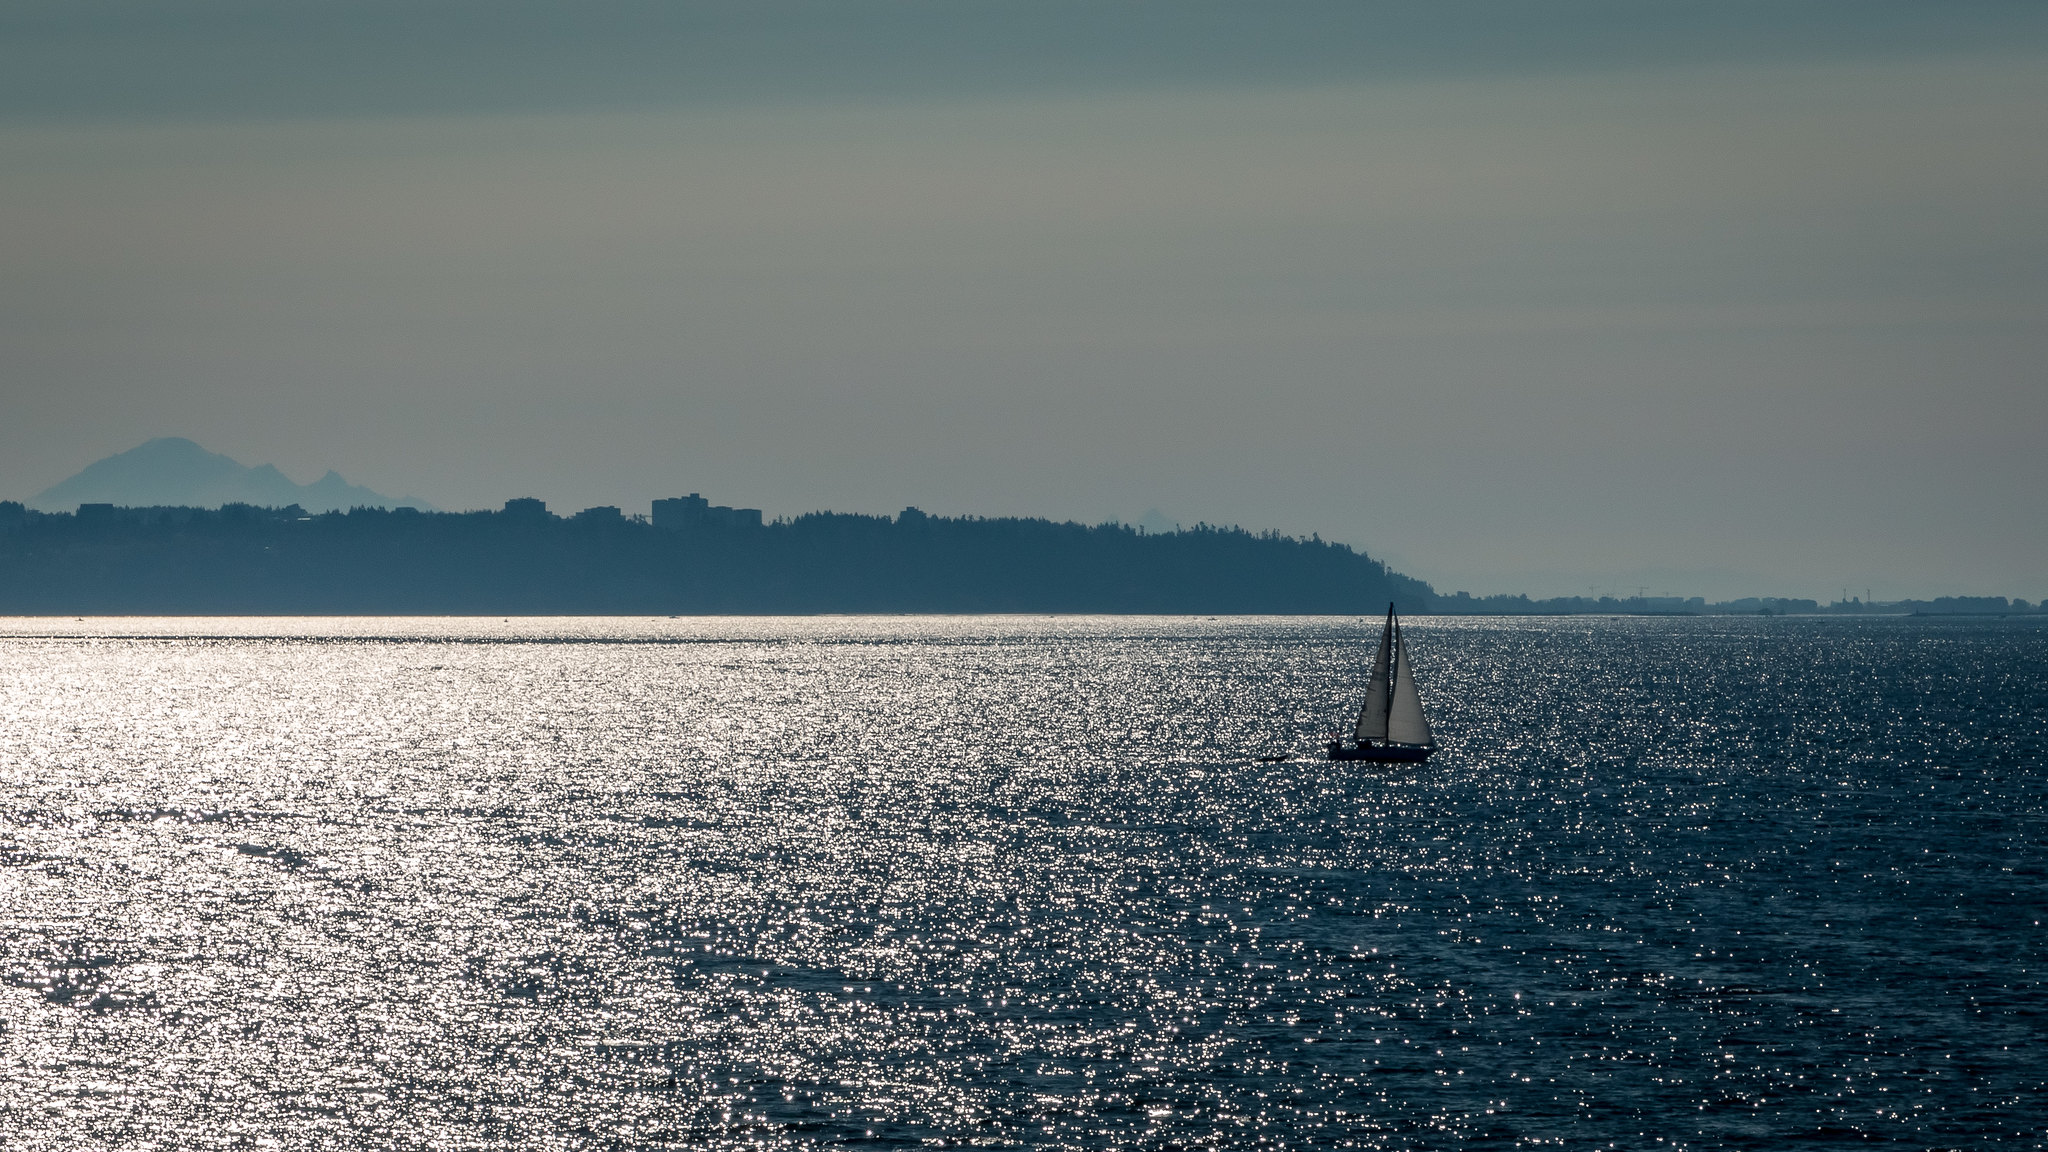 Salish Sea - Colombie Britannique - [Canada]